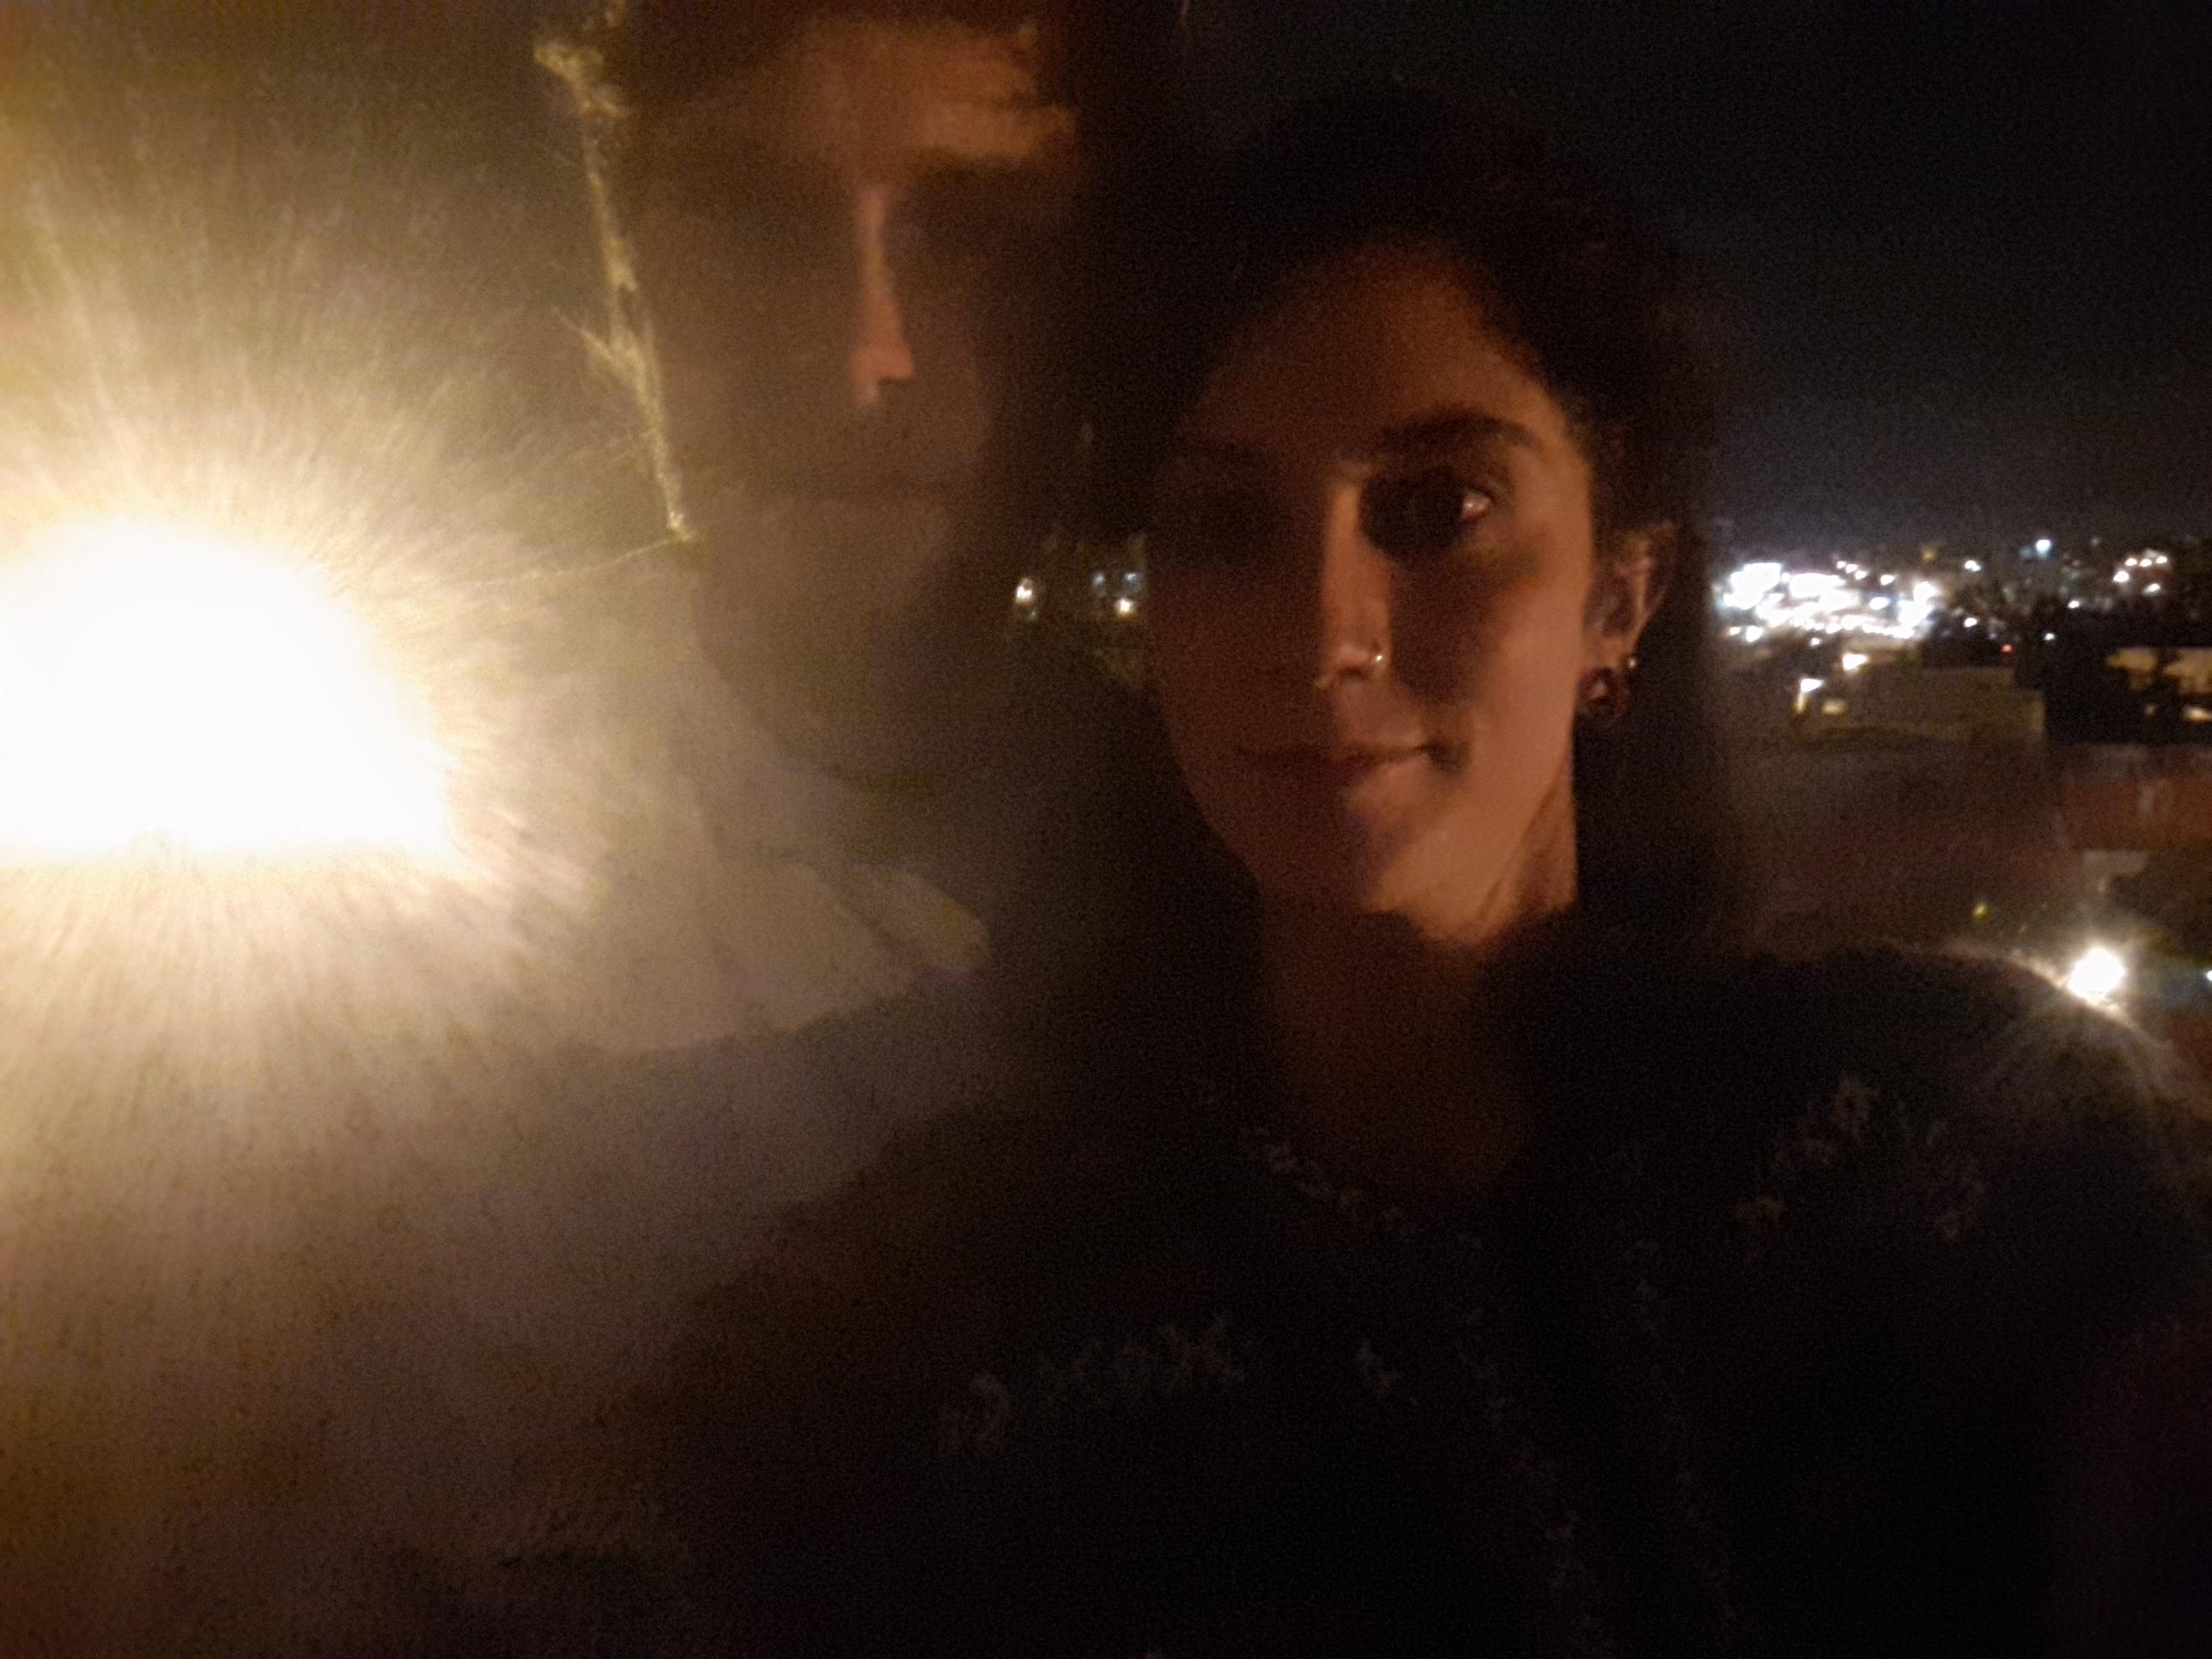 two people in a selfie